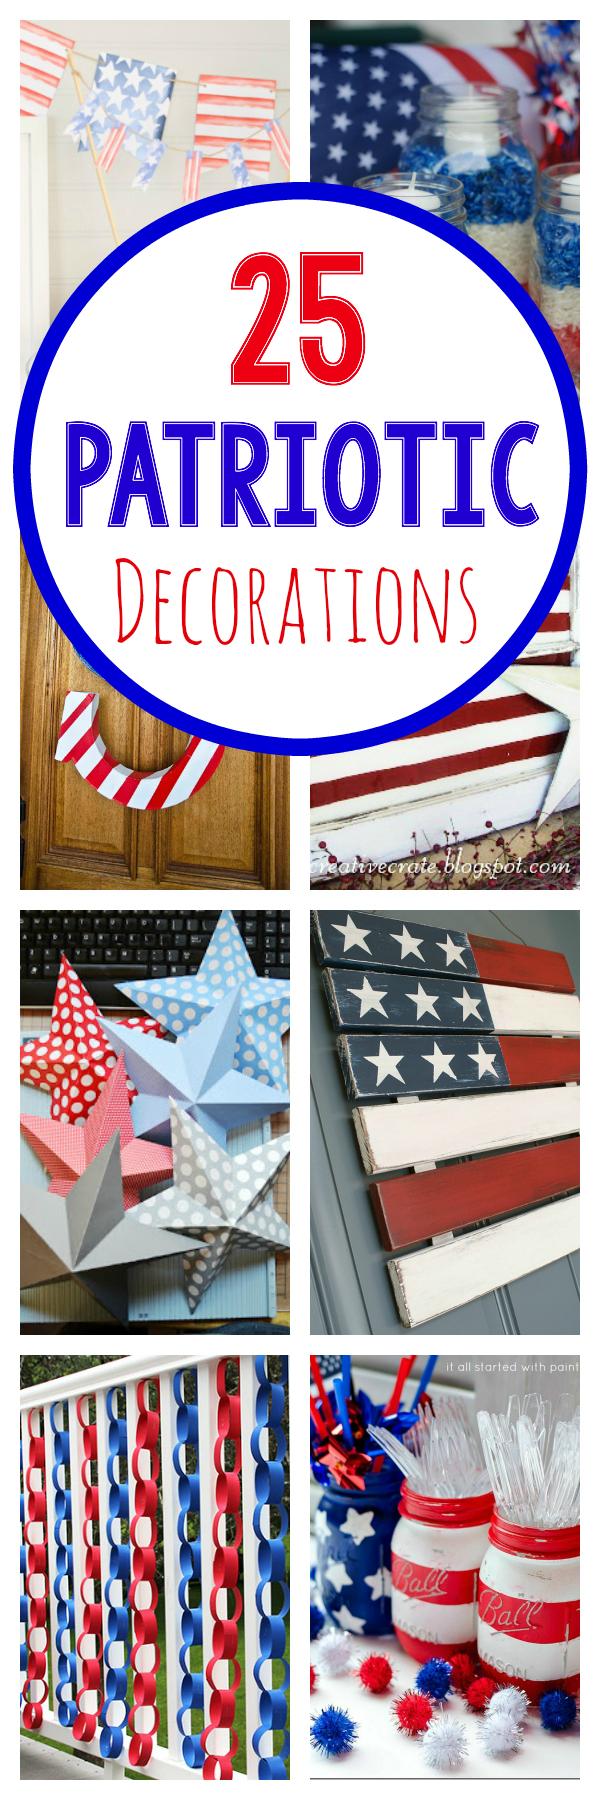 25 Patriotic Decorations to Make